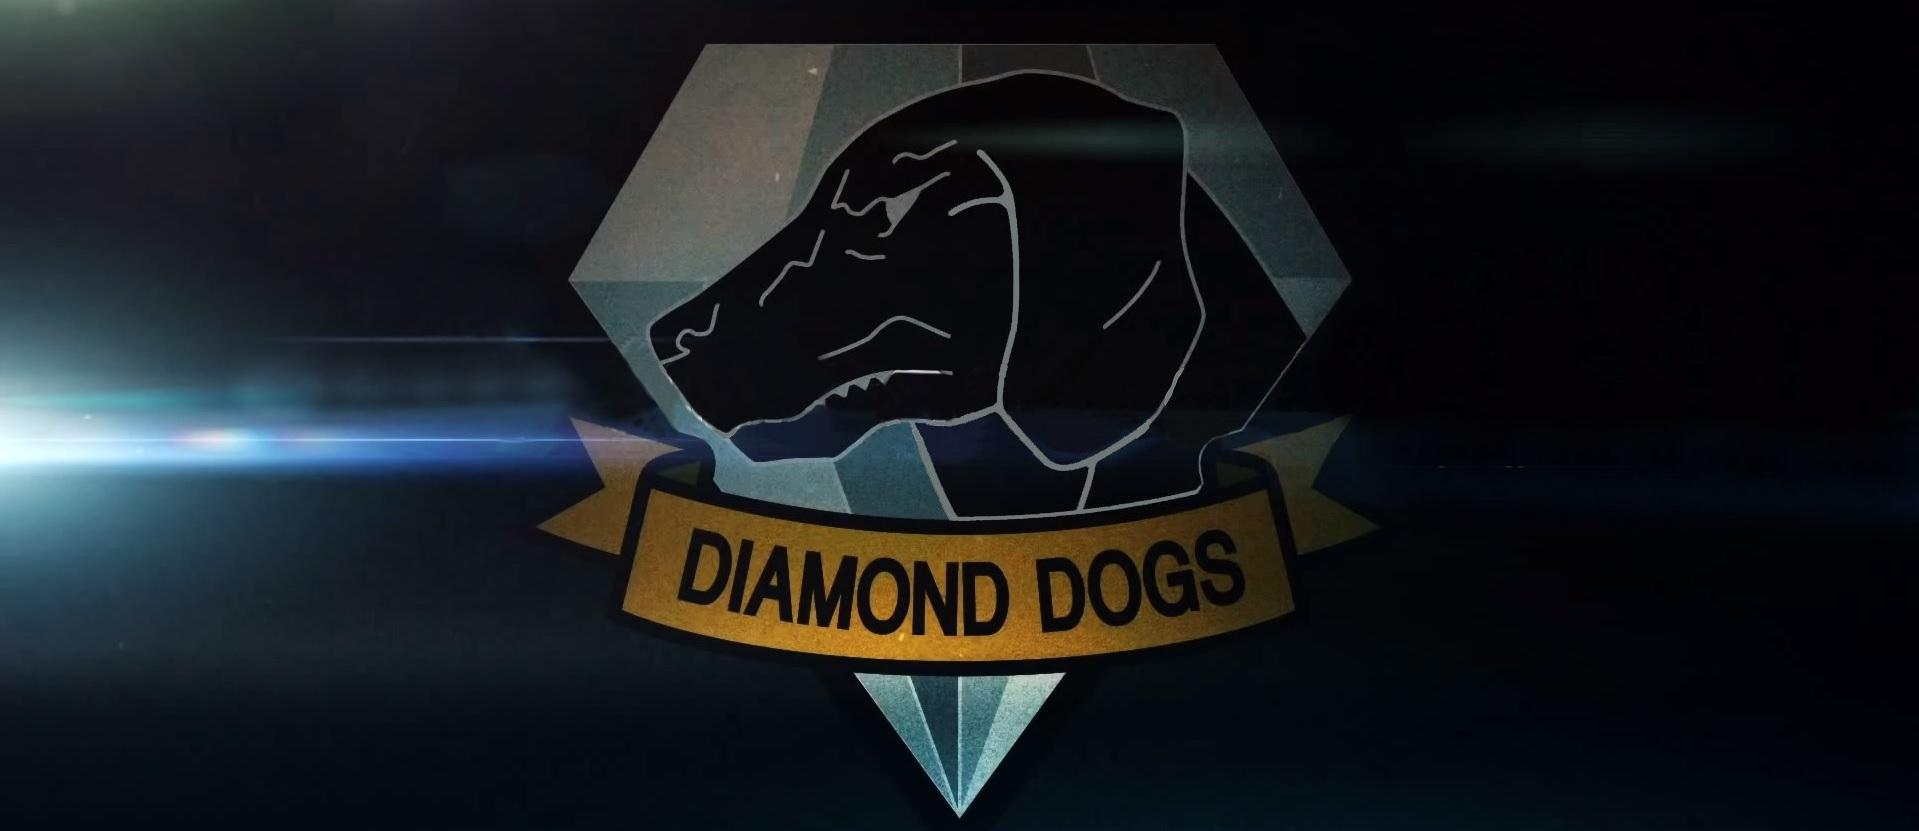 MGS 5 The Phantom Pain Diamond Dogs alle Infos zur 1919x831